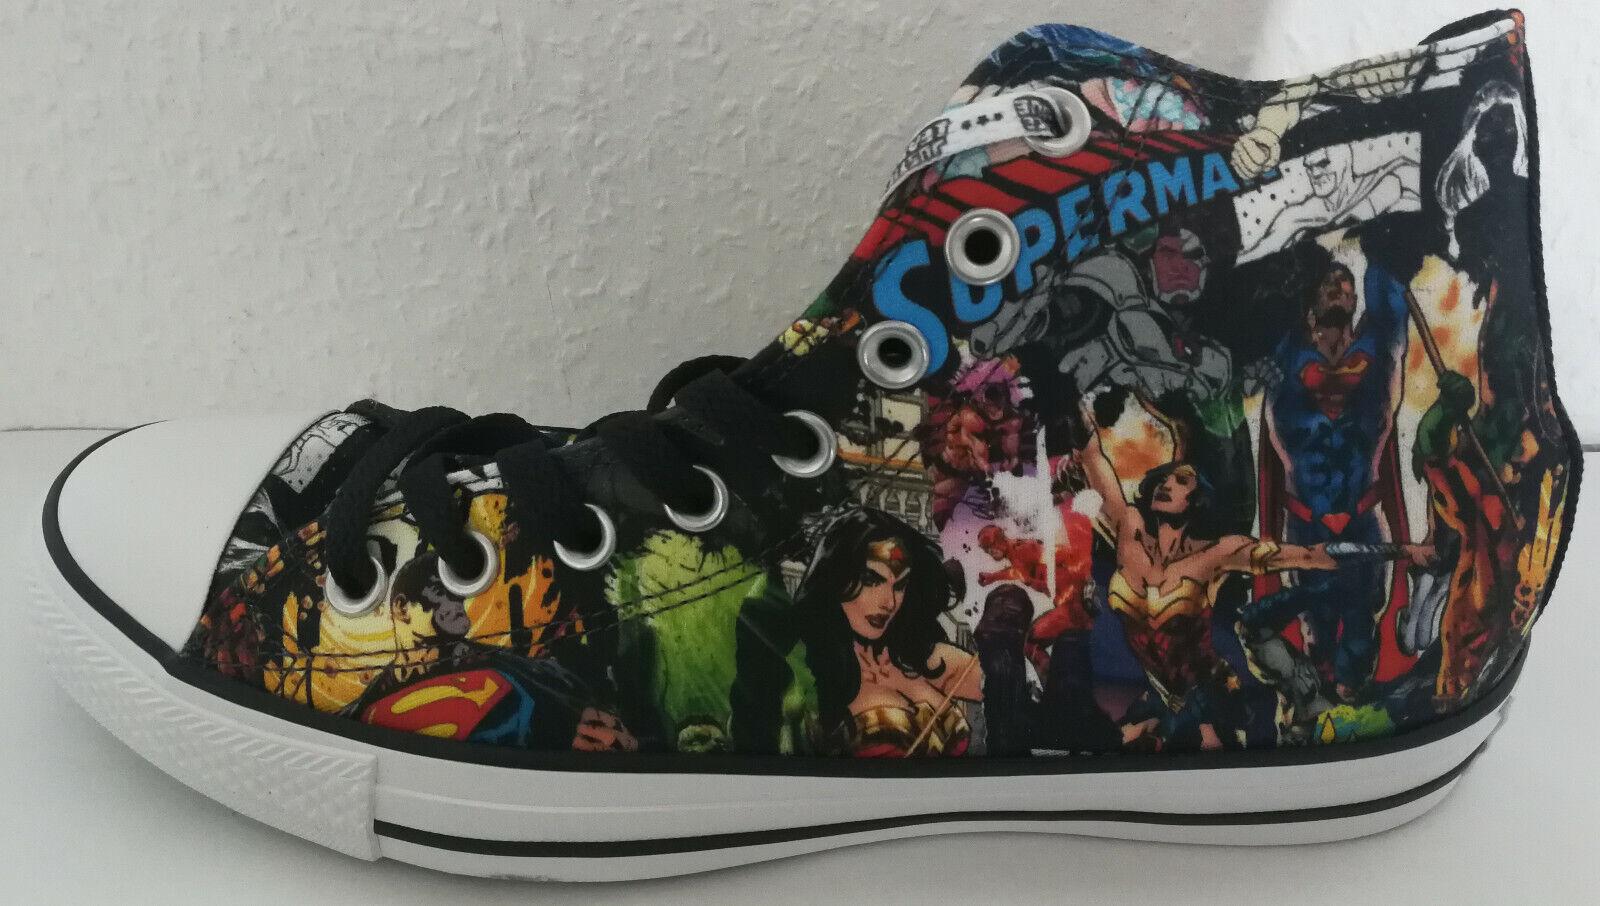 All Chuck Super Converse Heroes 41 League Chaussures Dc Star Justice lK1cTJF3